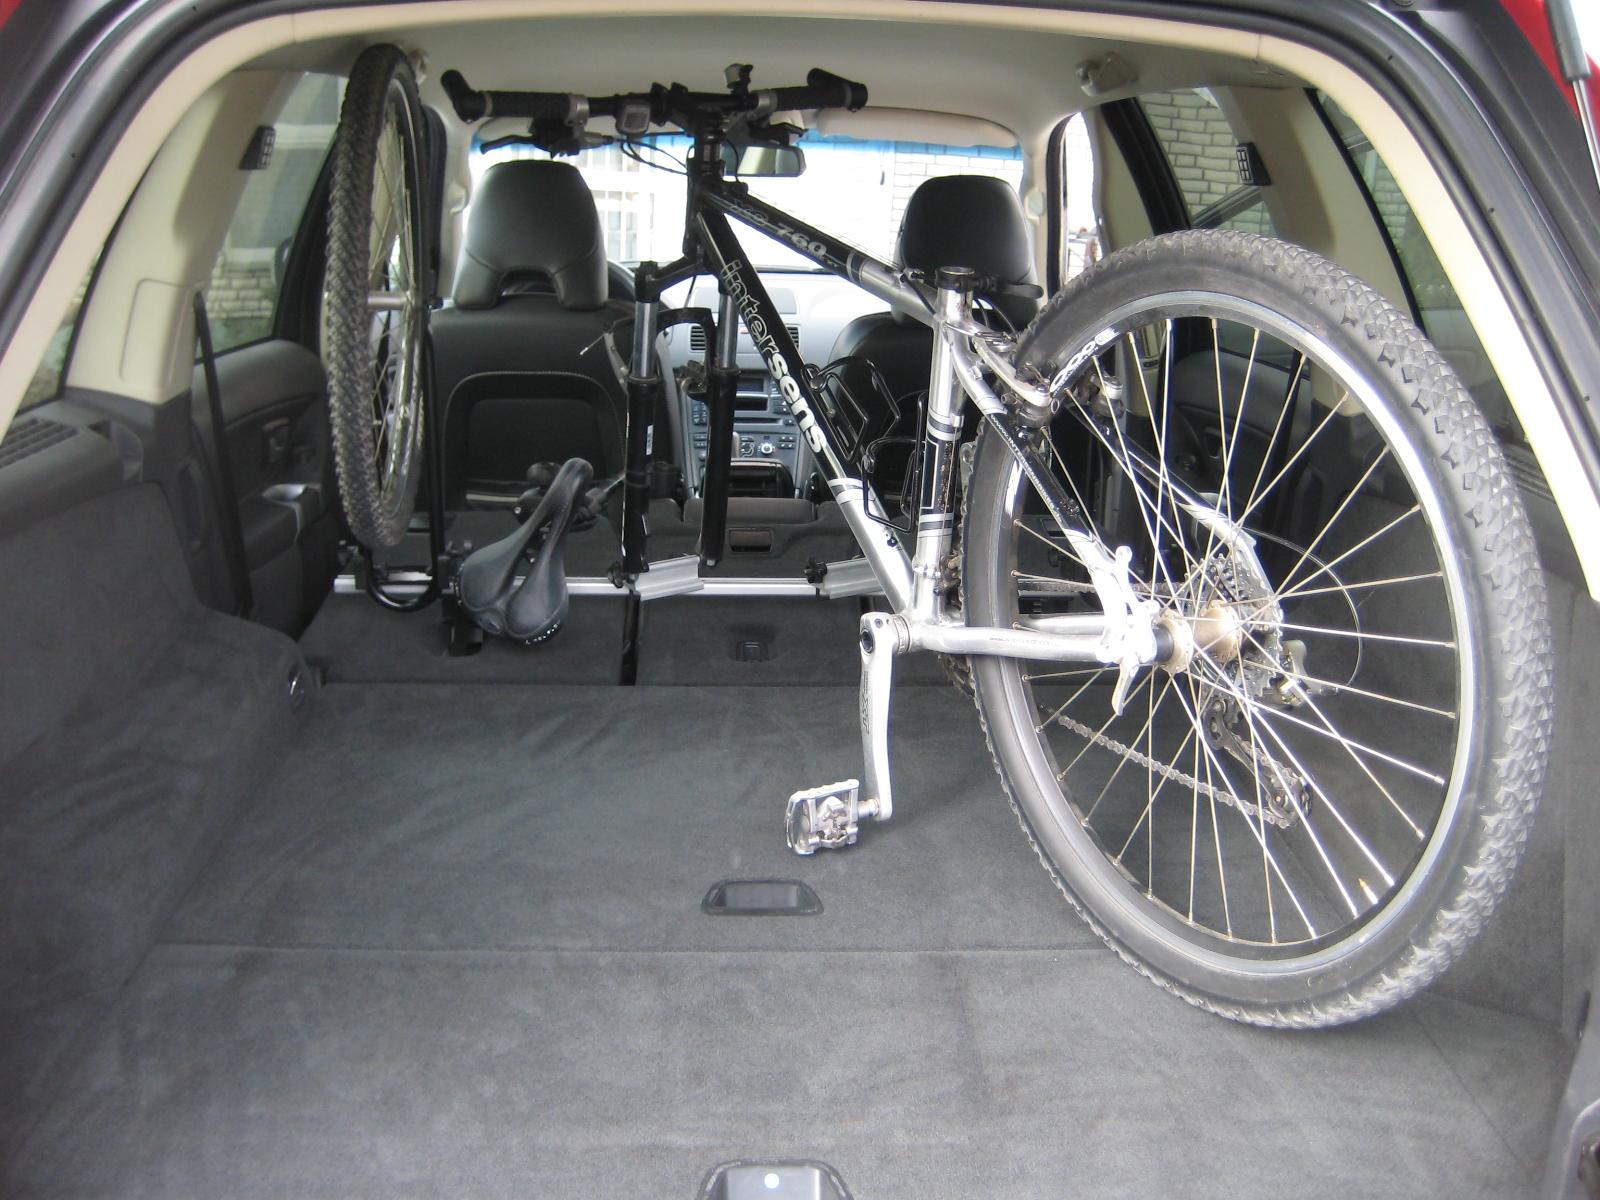 fahrradtr ger fahrradhalter f r volvo xc90 biete. Black Bedroom Furniture Sets. Home Design Ideas